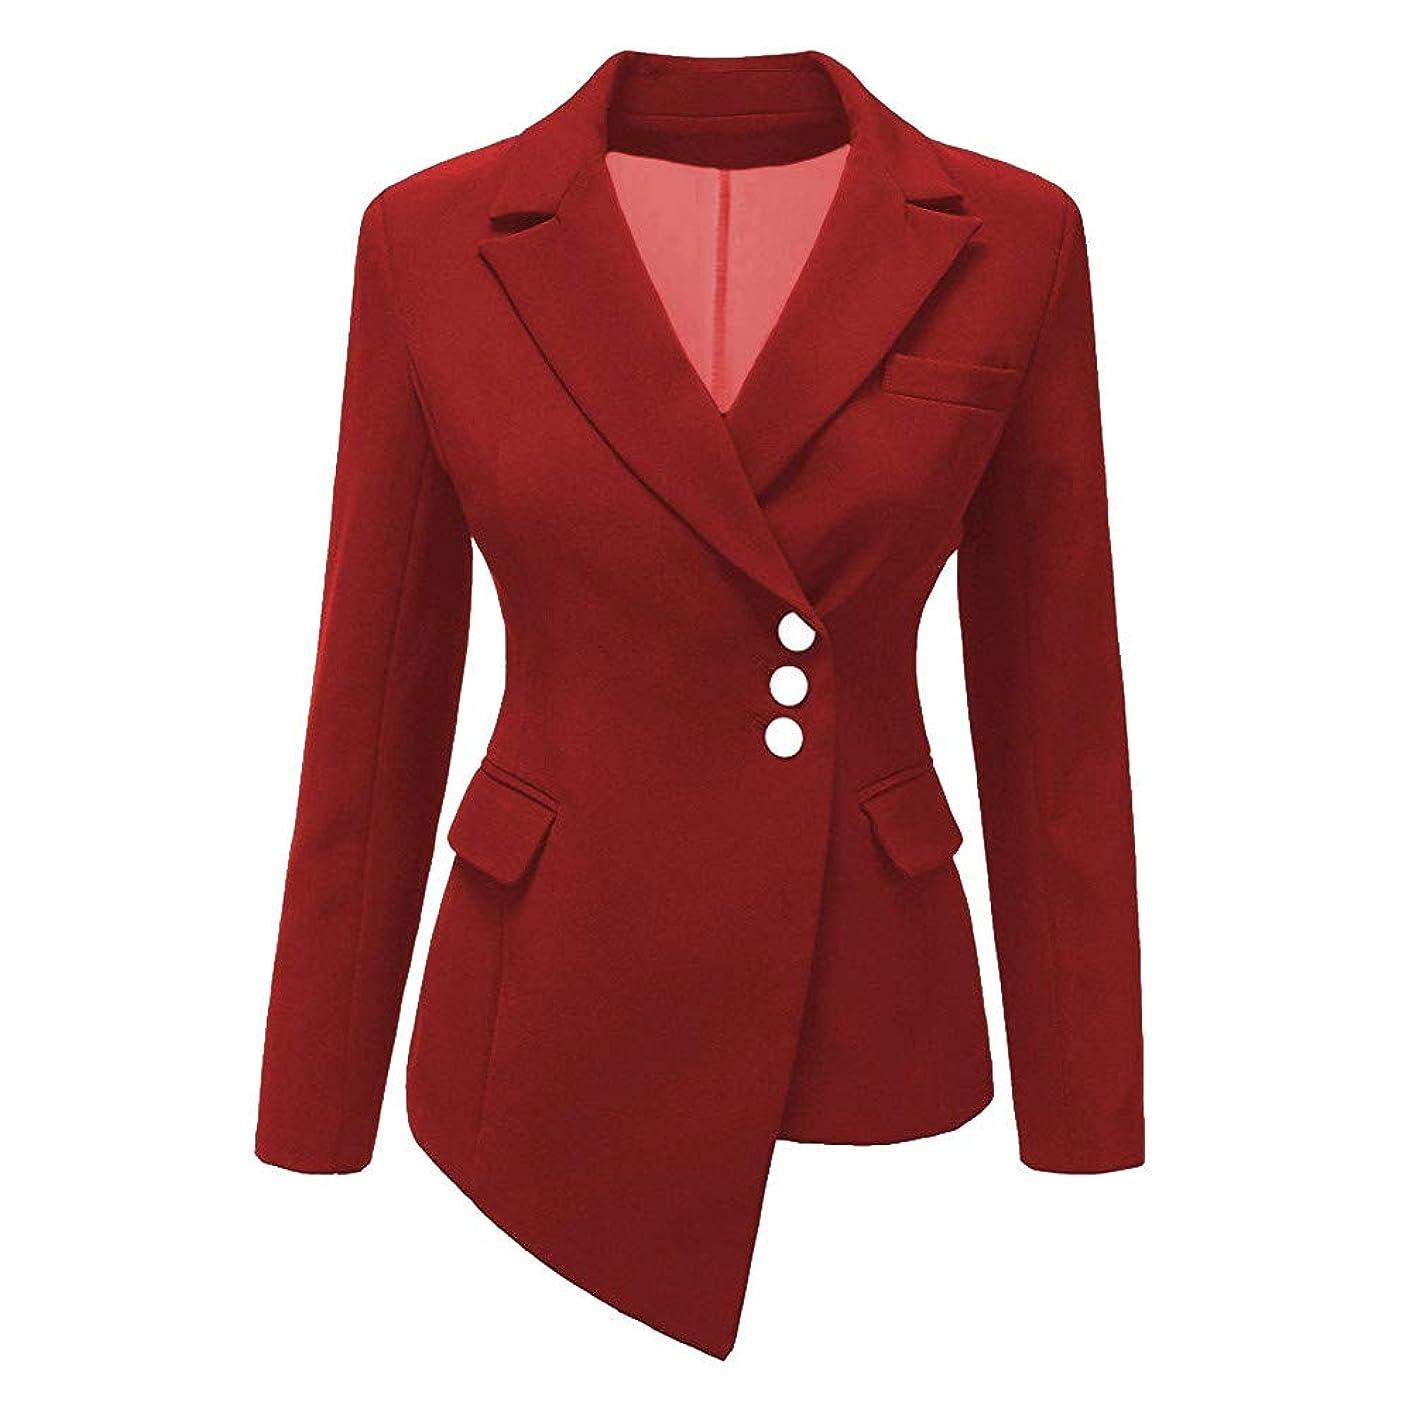 Usstore  Hot!Women Irregular Blazer Suit Fashion Elegant Slim Lapel Formal Outwear Coat Tops Business Attire